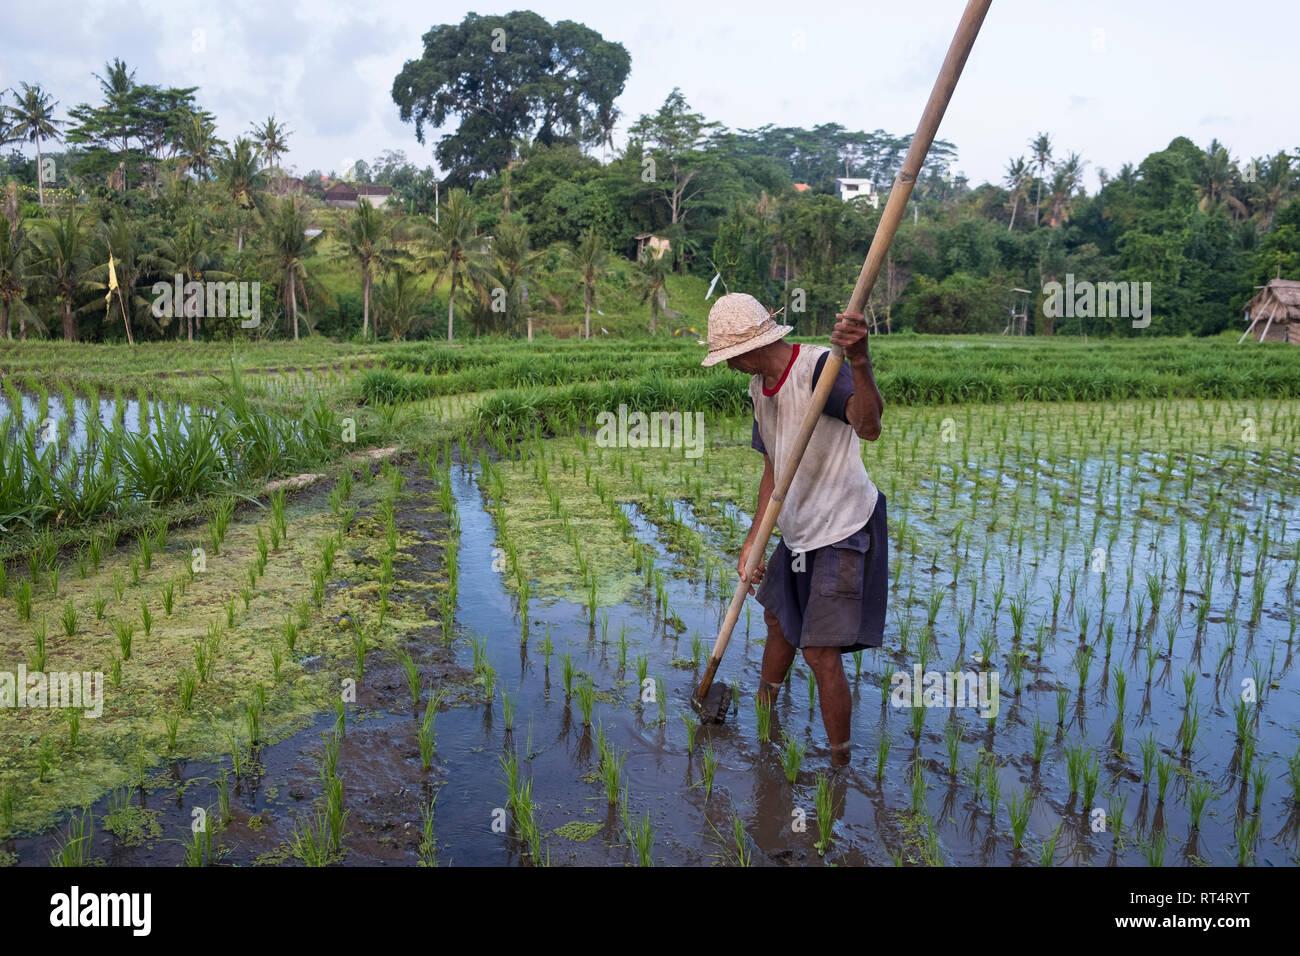 Rice farmer in the rice terraces of Jatiluwih, Bali, Indonesia Stock Photo